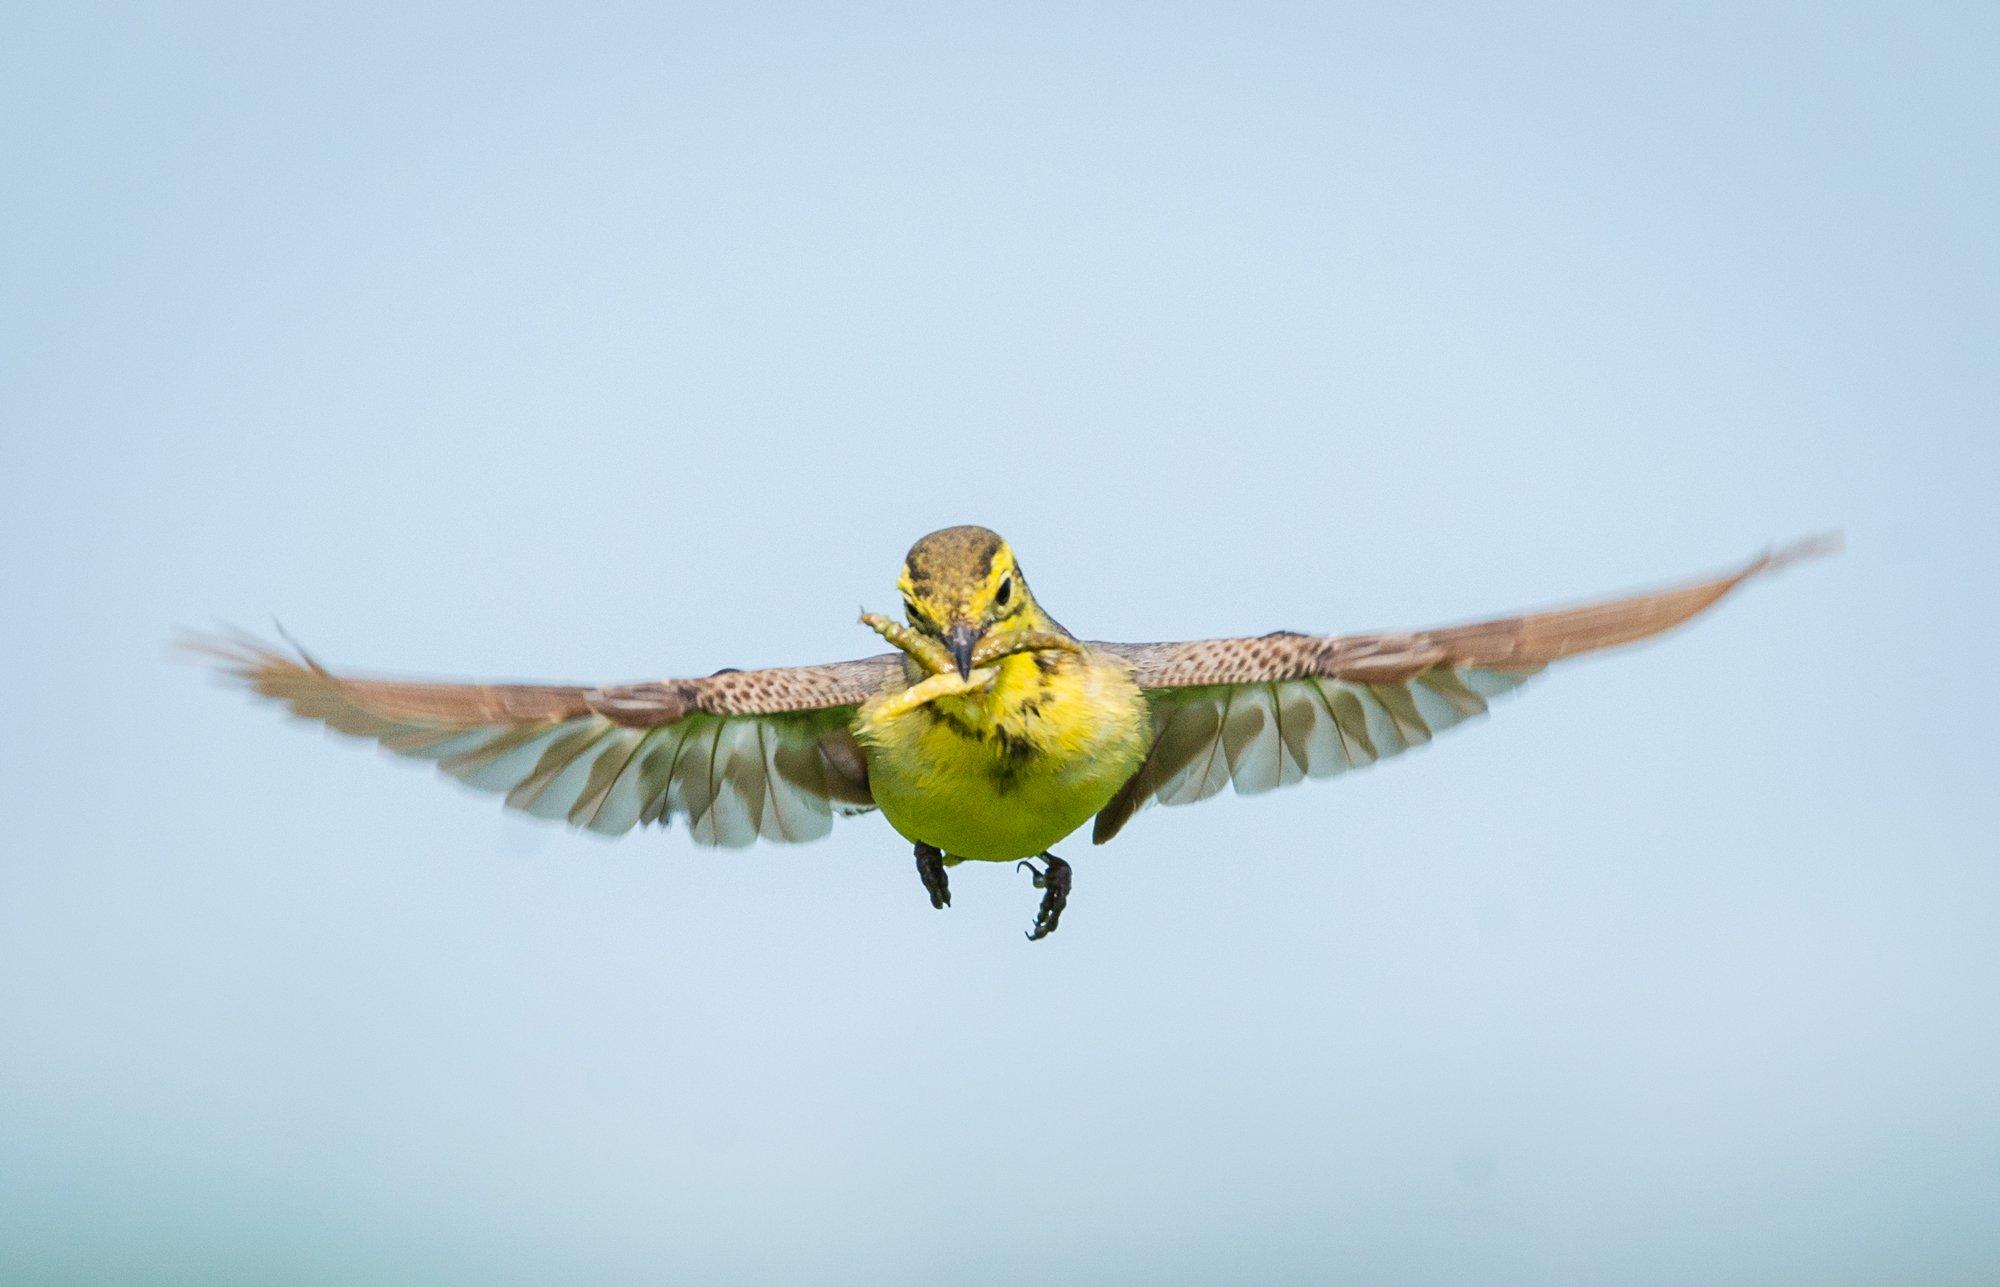 желтоголовая трясогузка, самка, citrine wagtail, motacilla citreola, птицы, birds, wings, Burov Evgeny